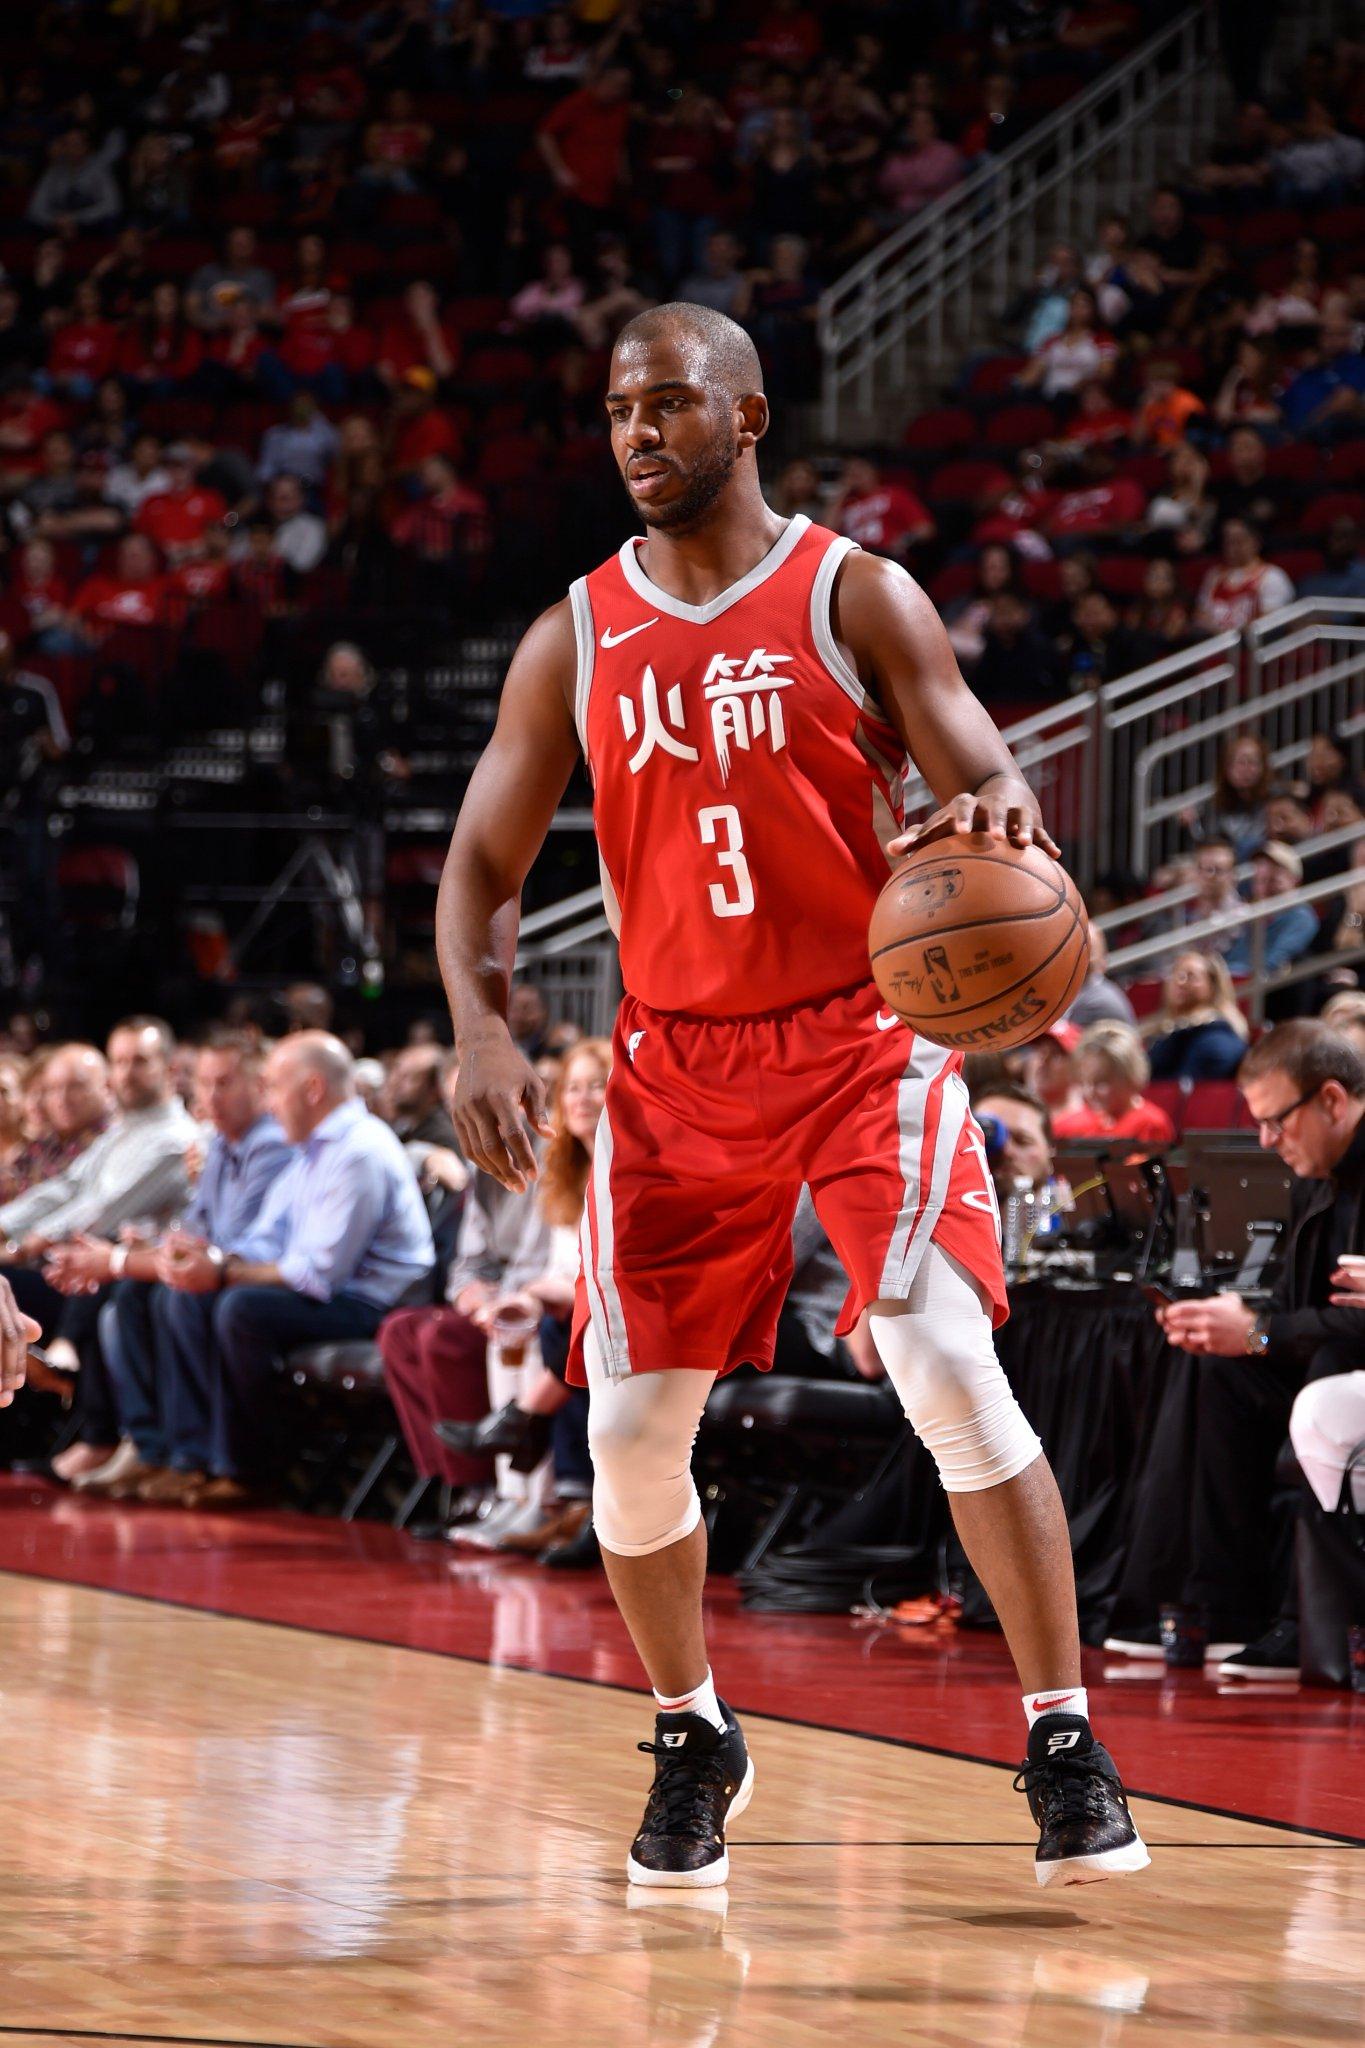 End of 1 ⤵️  #Rockets 26 Timberwolves 32 https://t.co/xn3JkdUVBF